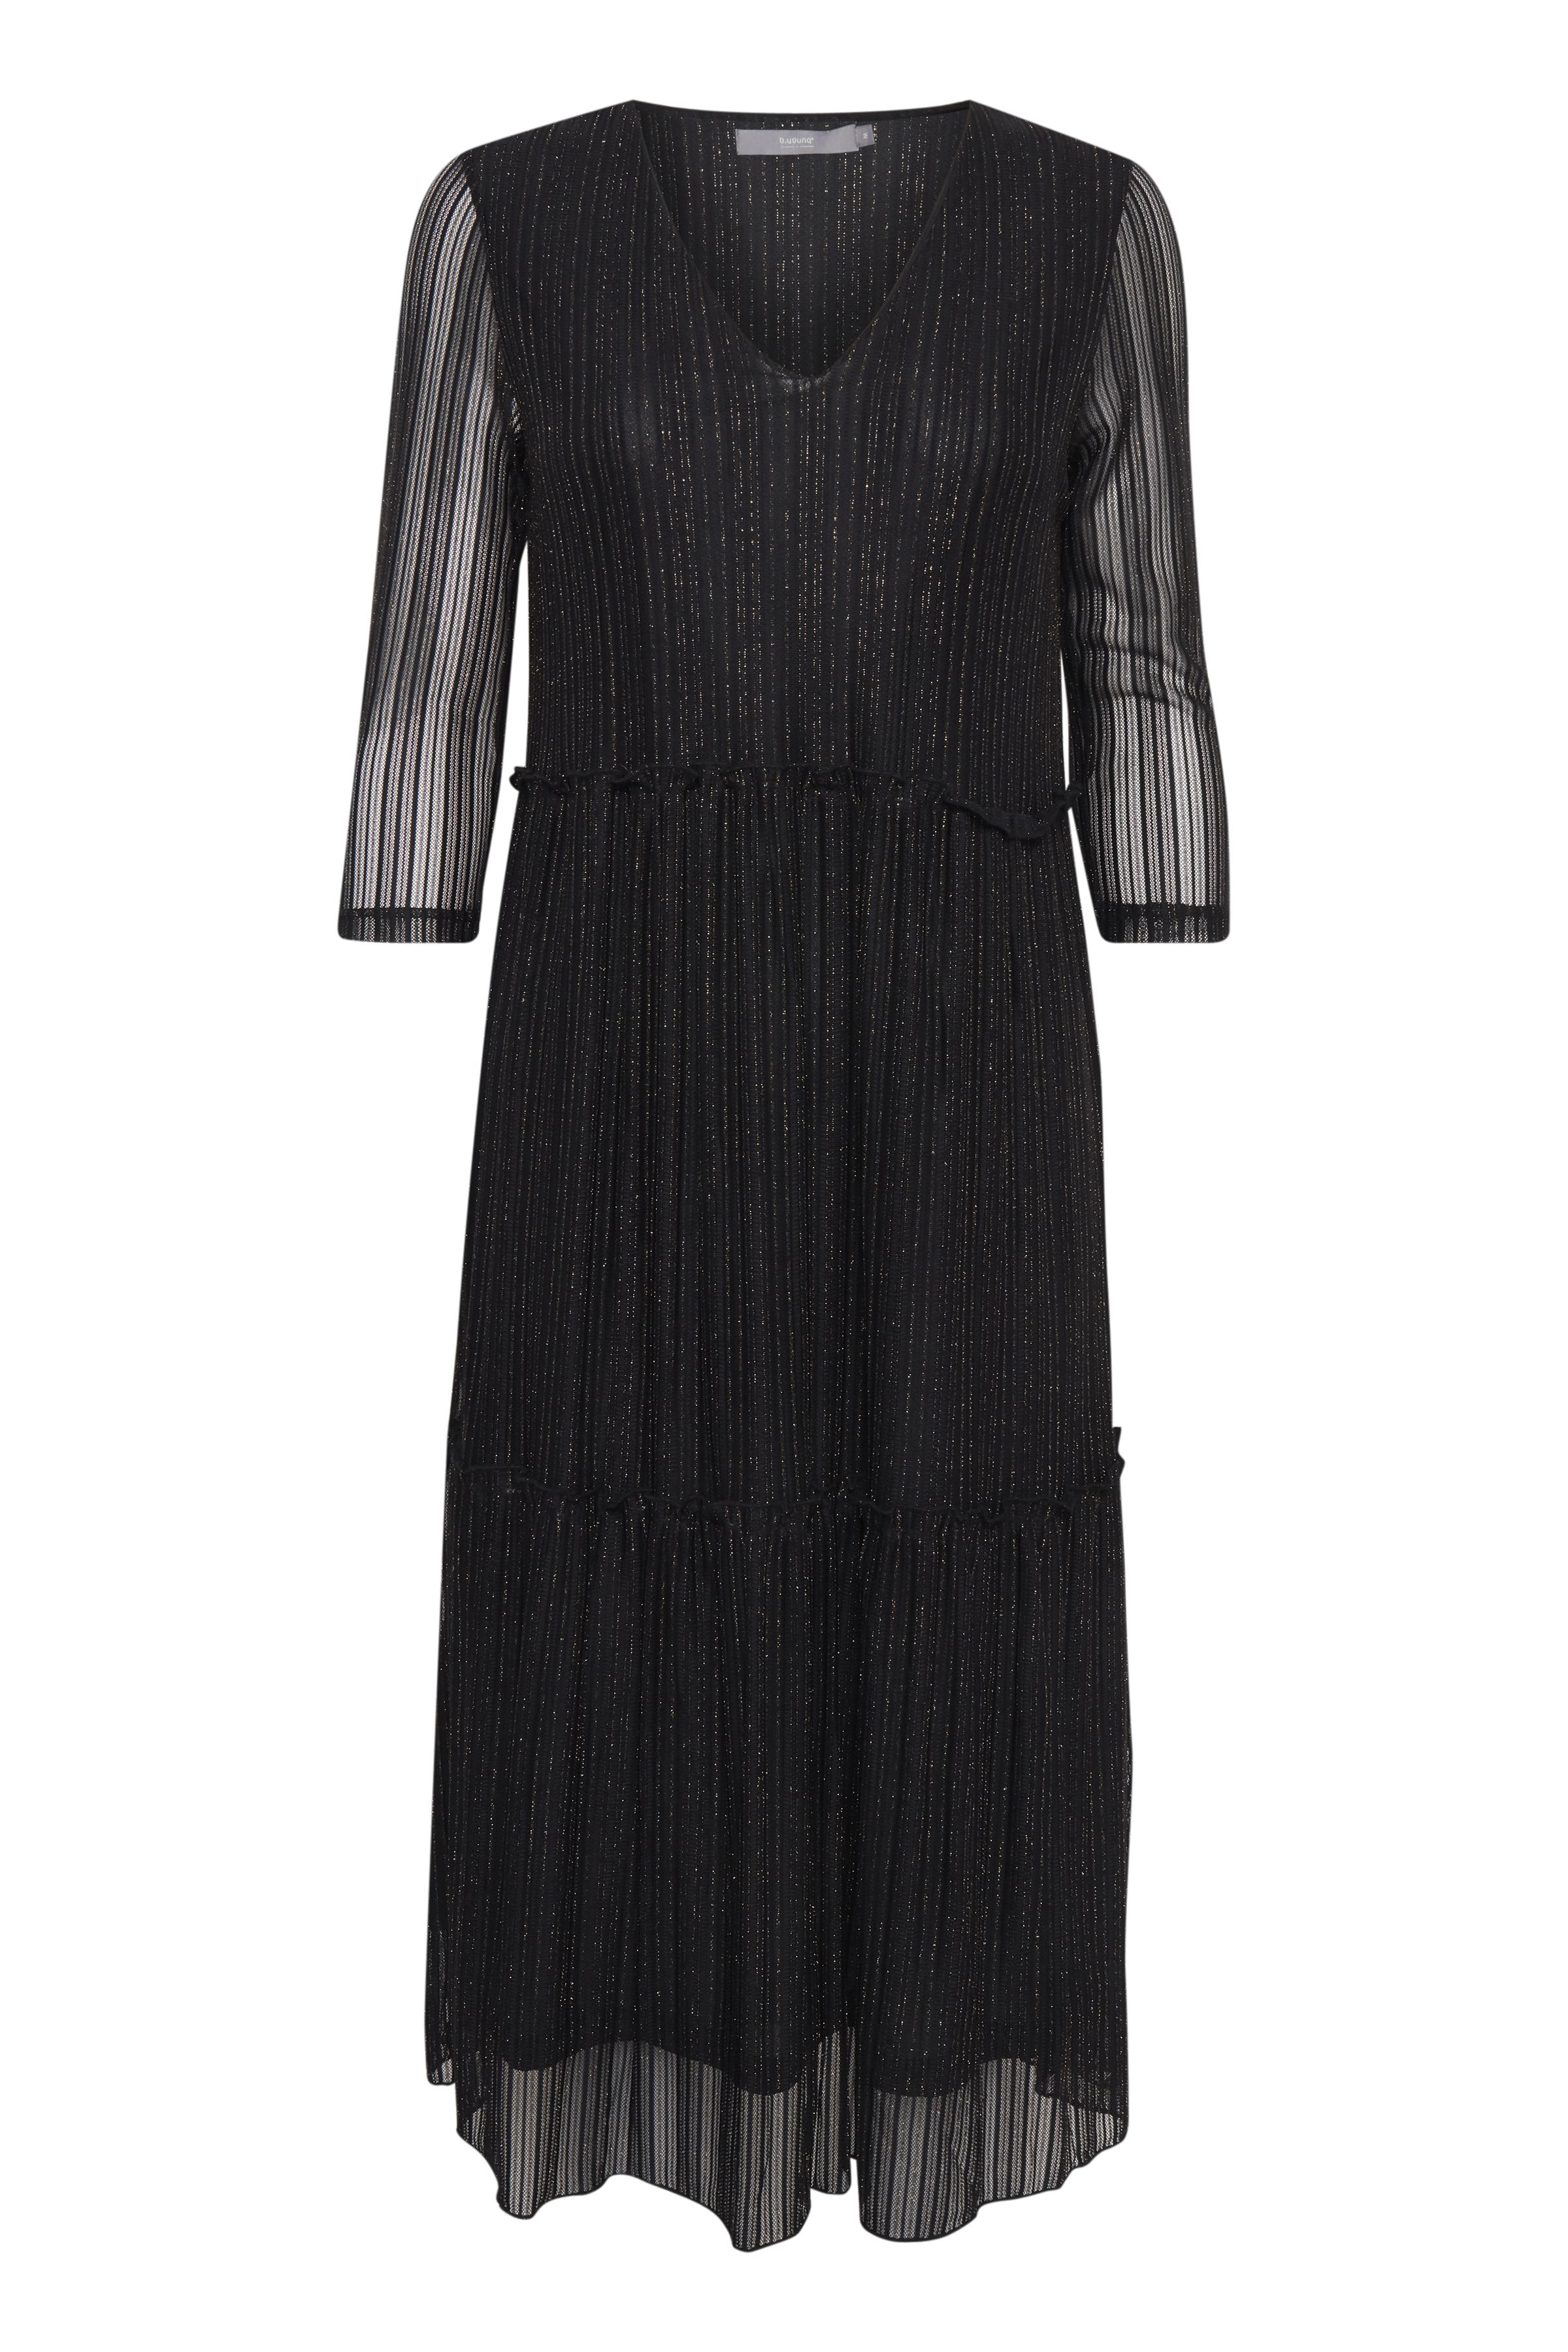 Black Jerseykjole fra b.young – Køb Black Jerseykjole fra str. S-XXL her